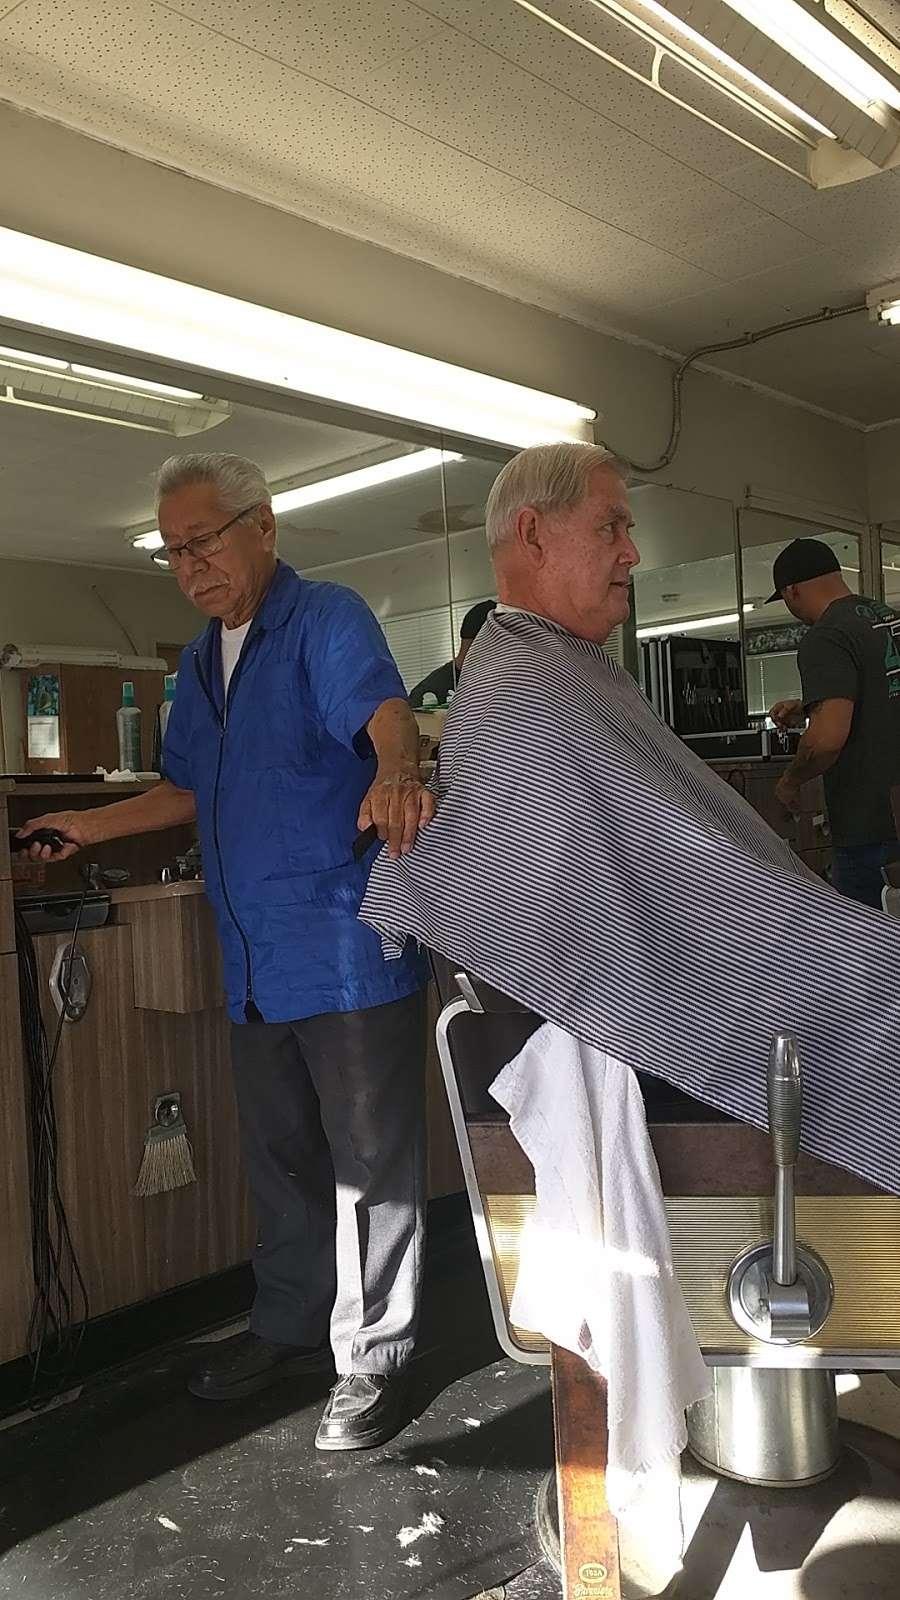 DAPPER B'S BARBERSHOP - hair care  | Photo 1 of 3 | Address: 6929 North Ave, Lemon Grove, CA 91945, USA | Phone: (619) 465-3964